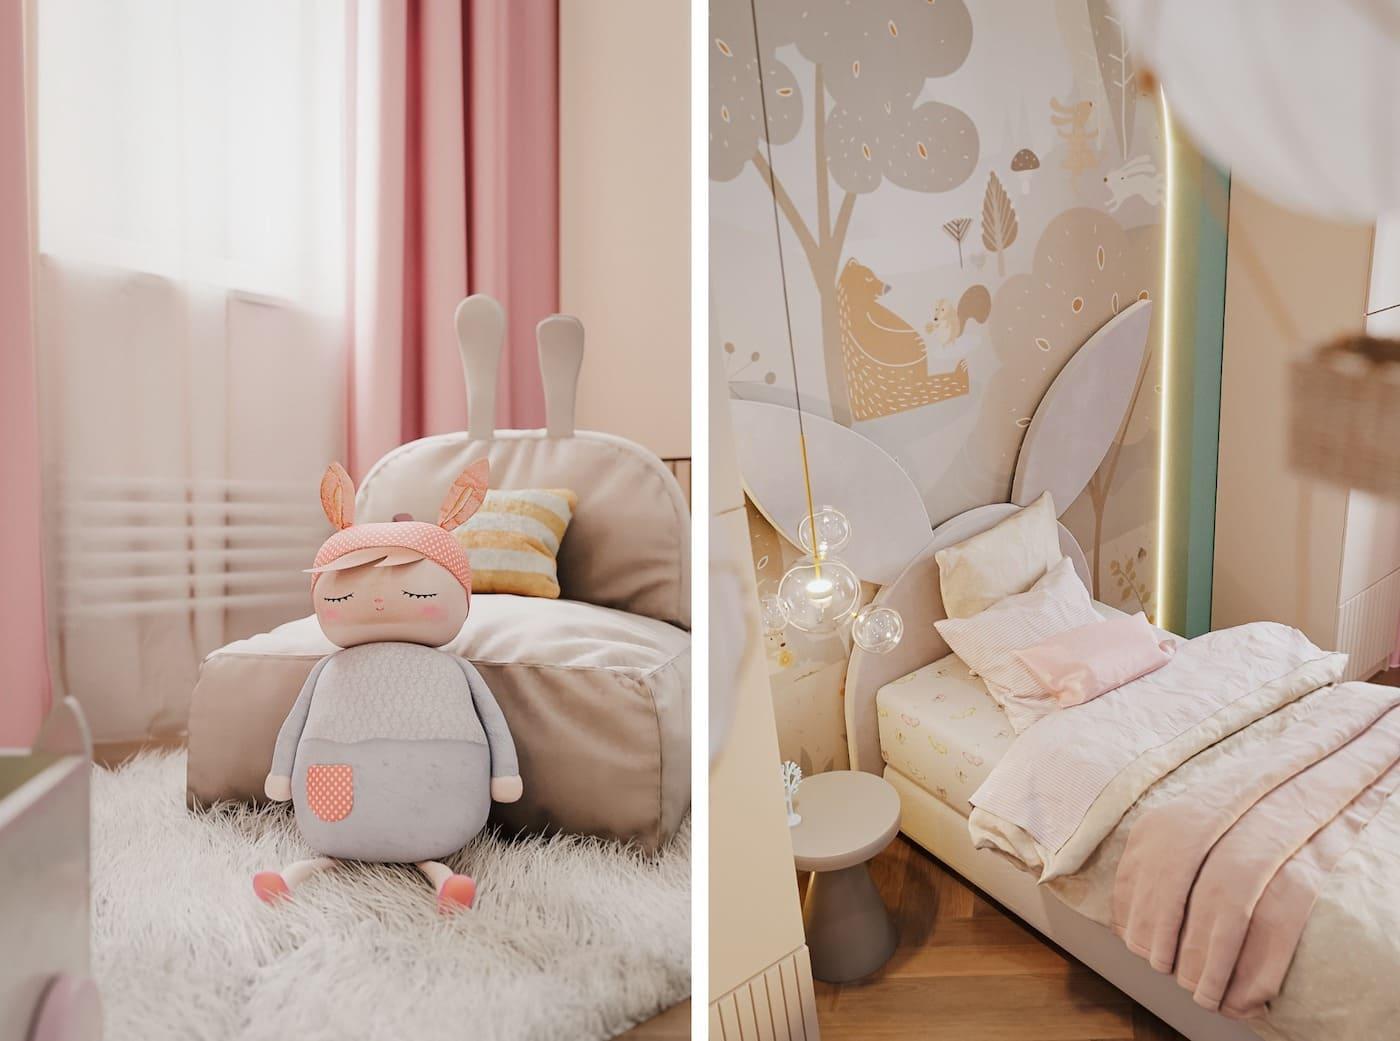 интерьер детской комнаты фото 81